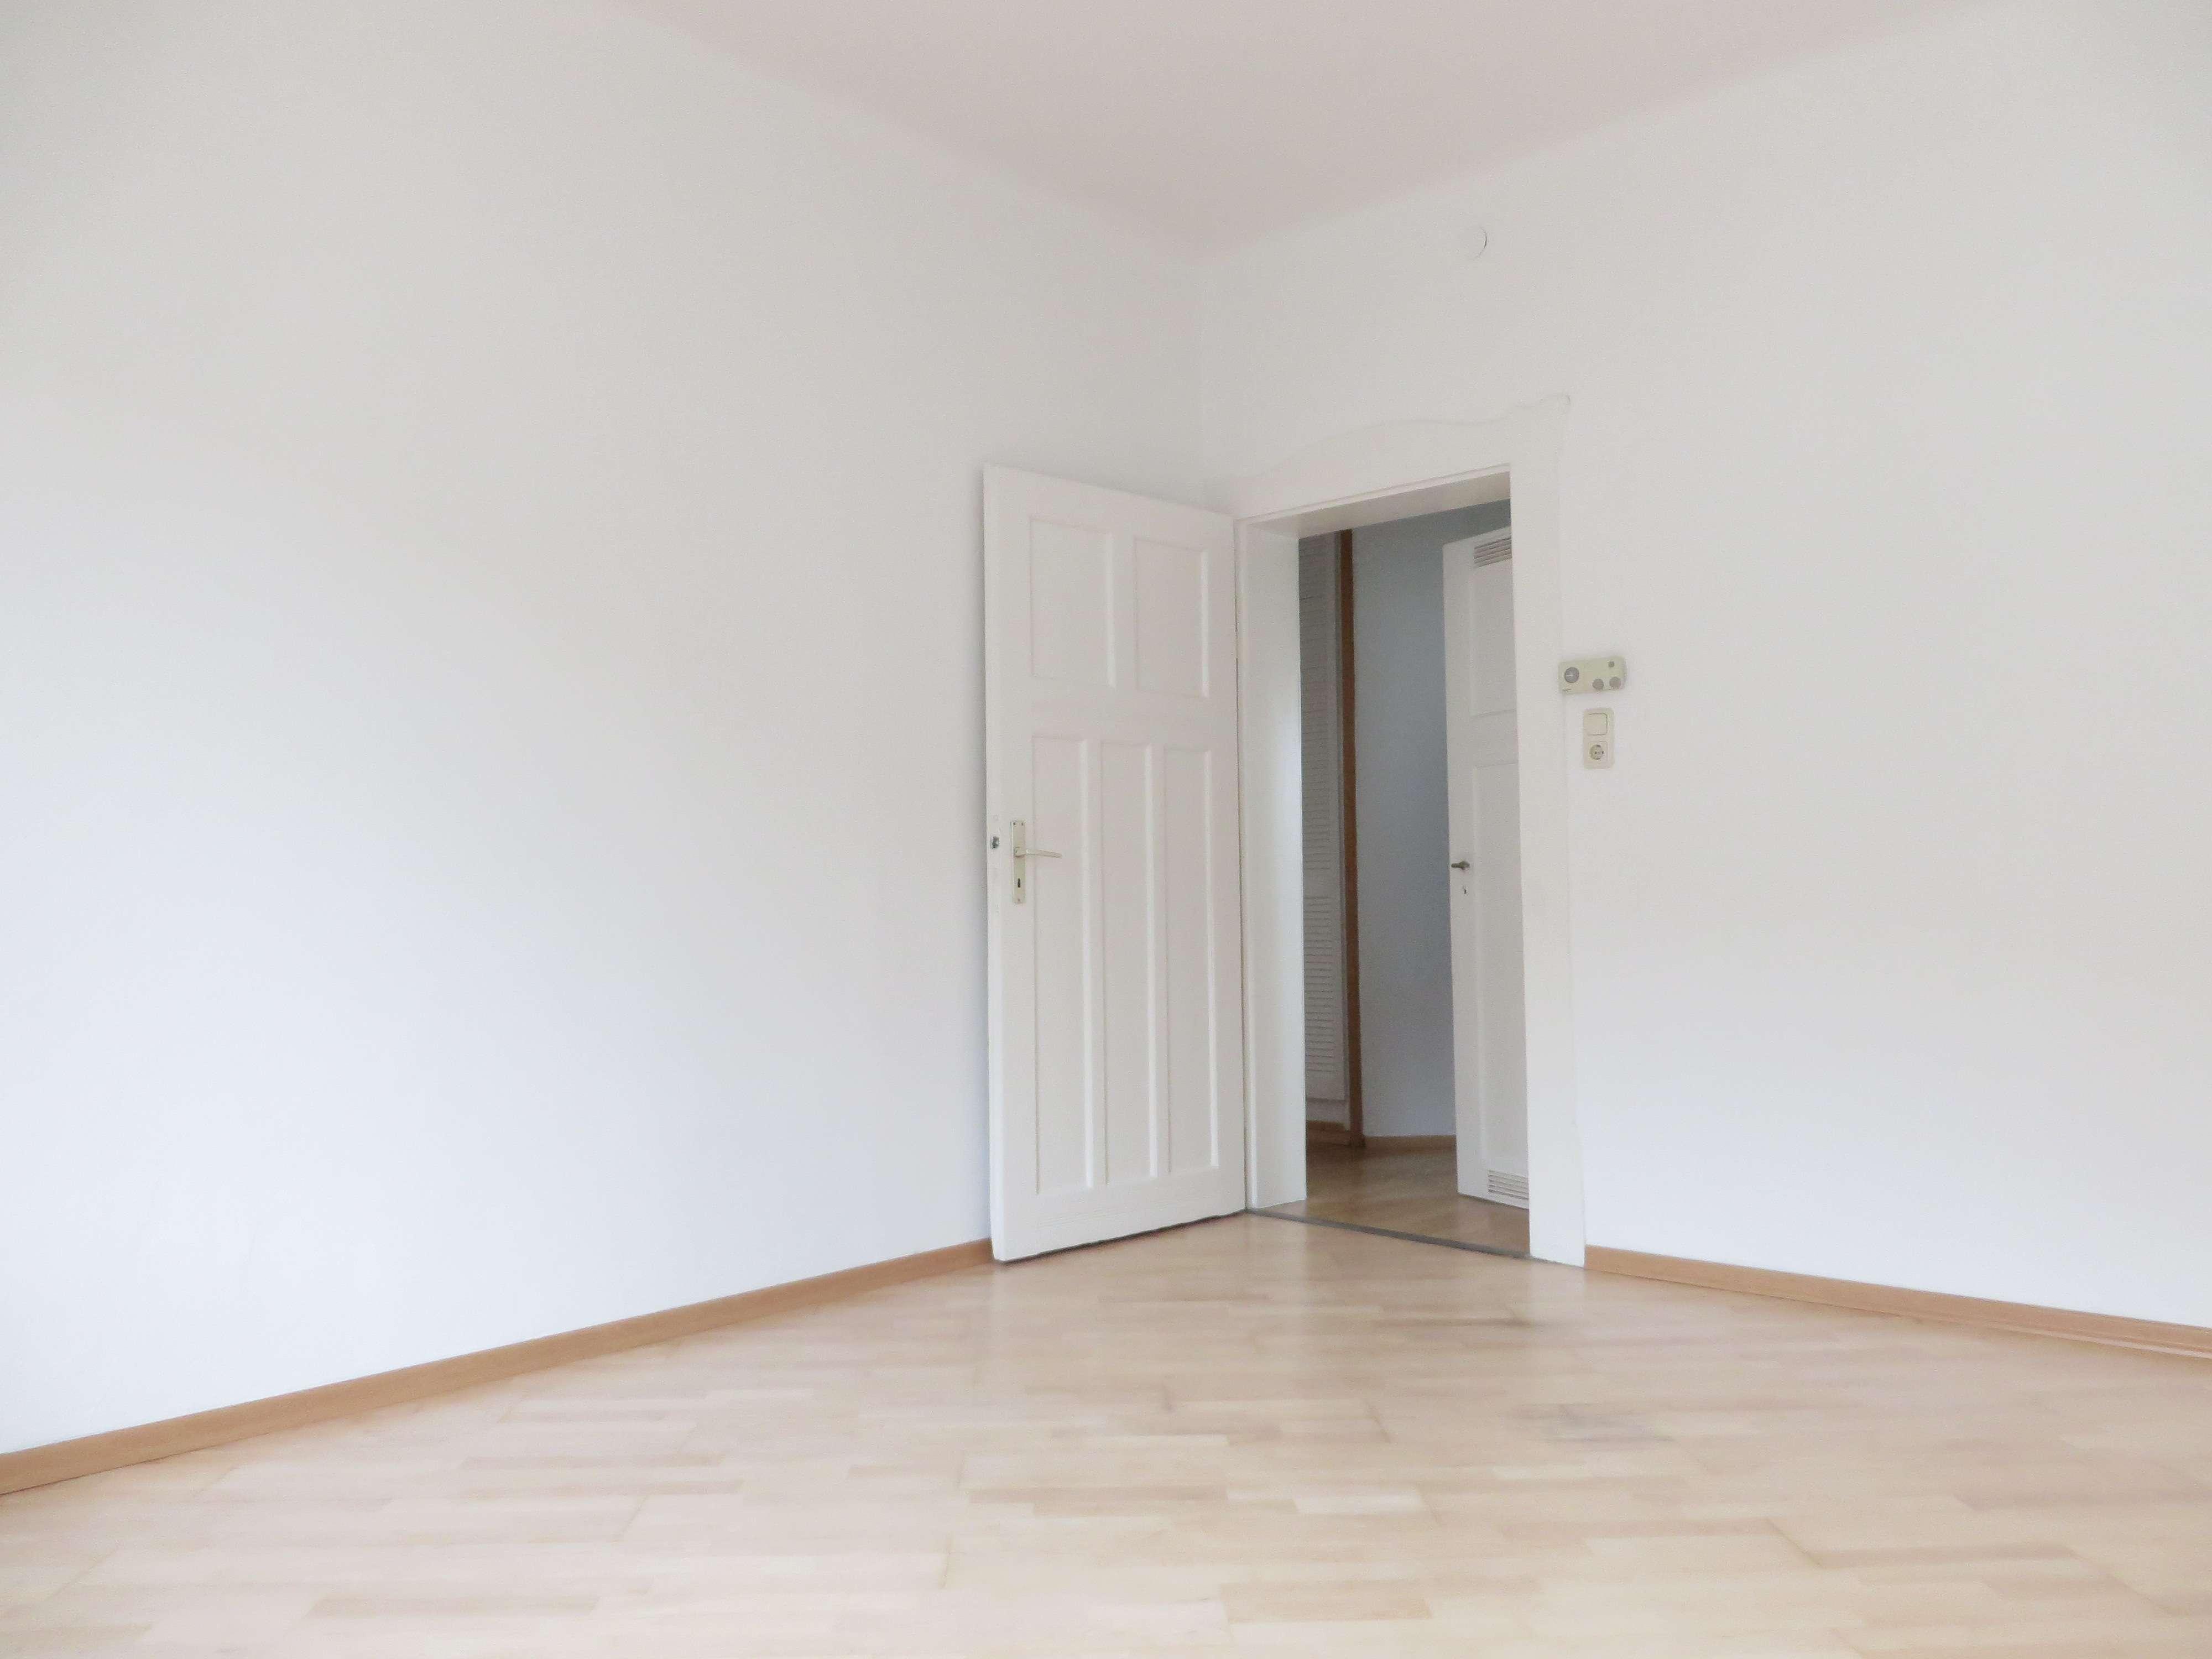 Nähe Pillenreuther Straße ! Renovierte 3-Zi.-Altbauwhg. ca. 71 qm, WG geeignet im 4.OG ohne Aufzug in Galgenhof (Nürnberg)